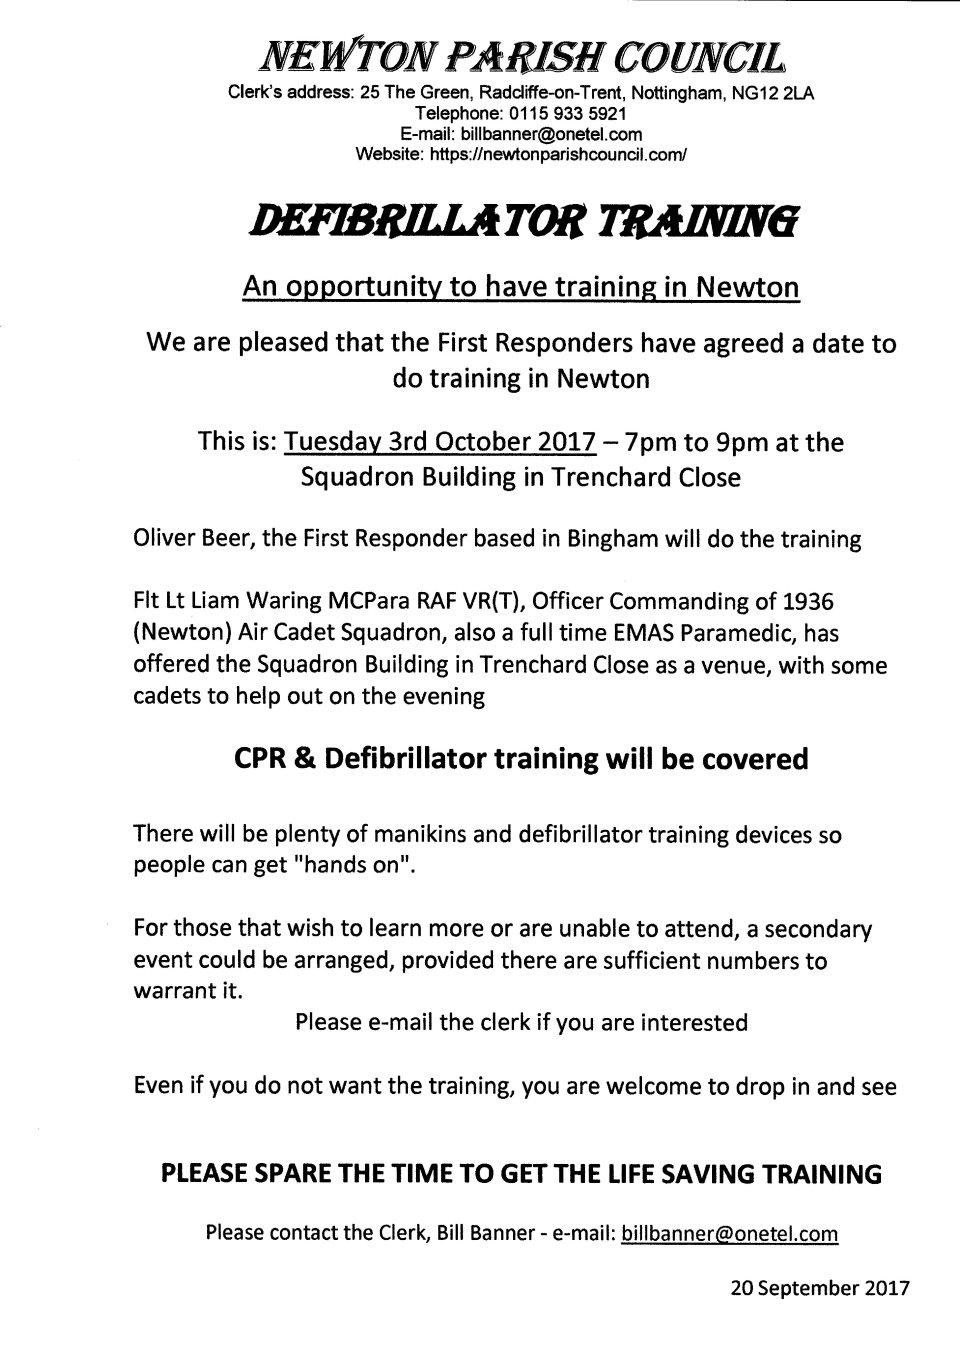 defib training004.jpg